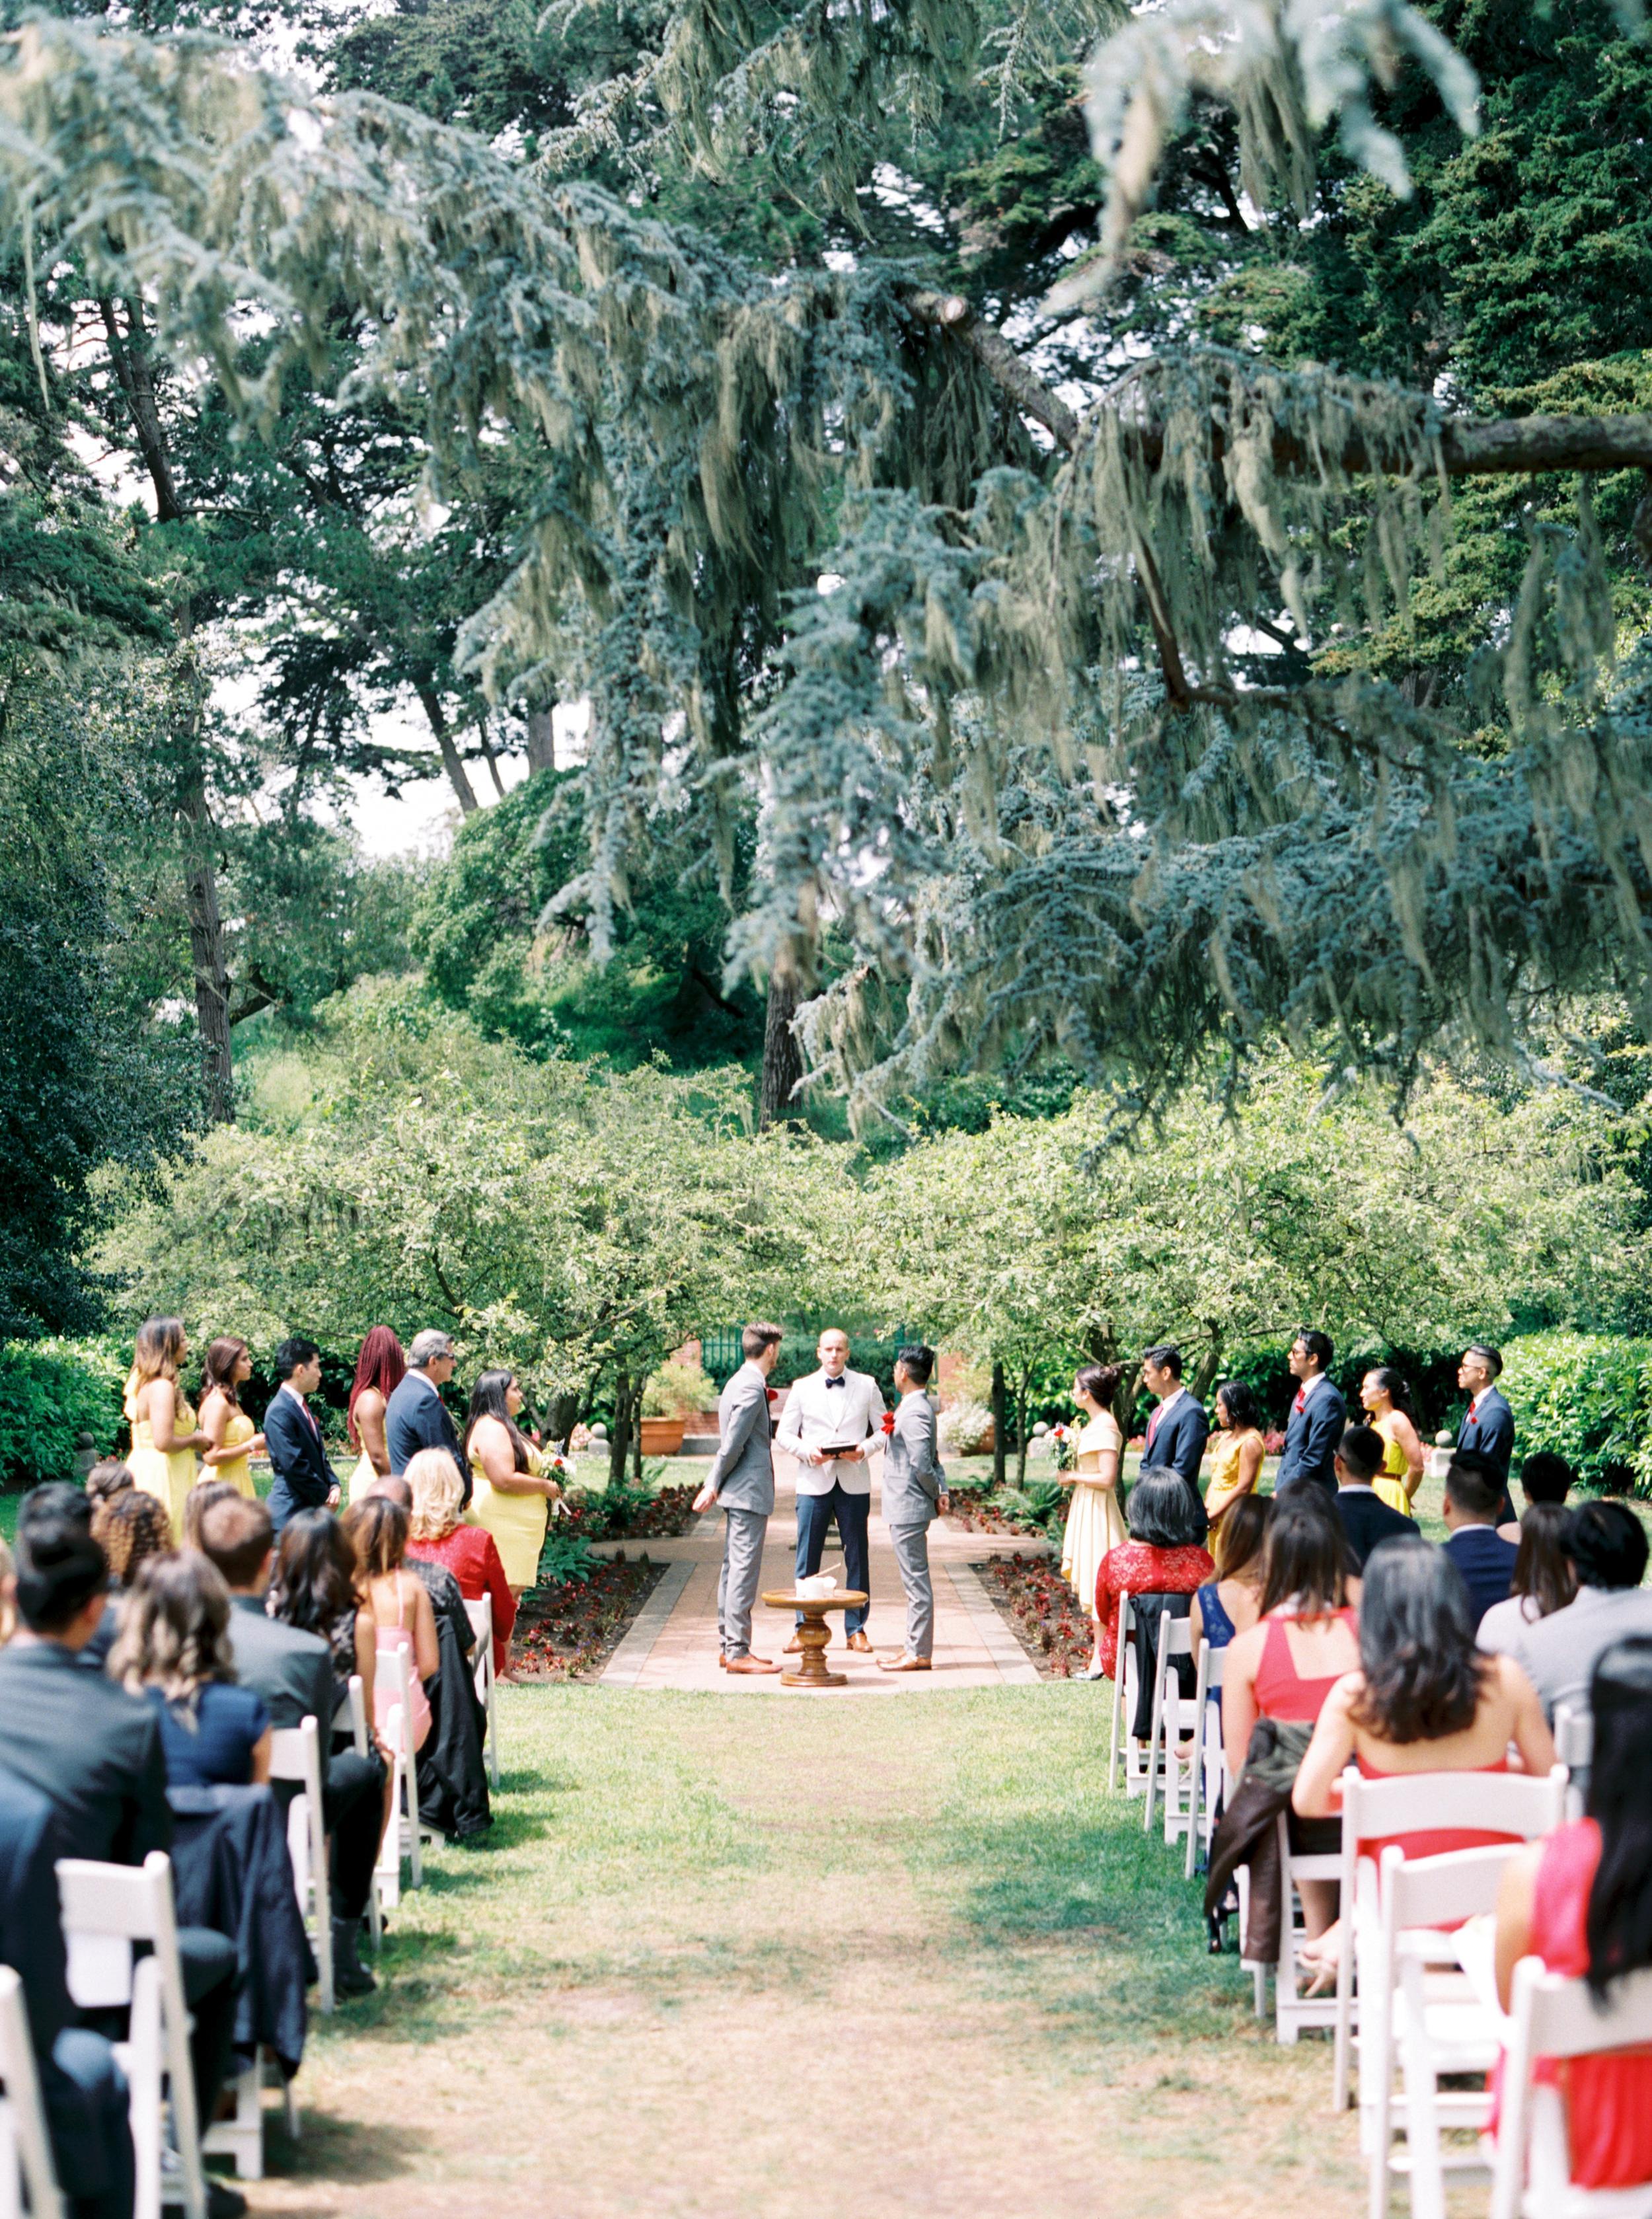 shakespeare-garden-golden-gate-park-san-francisco-wedding-photography-16.jpg